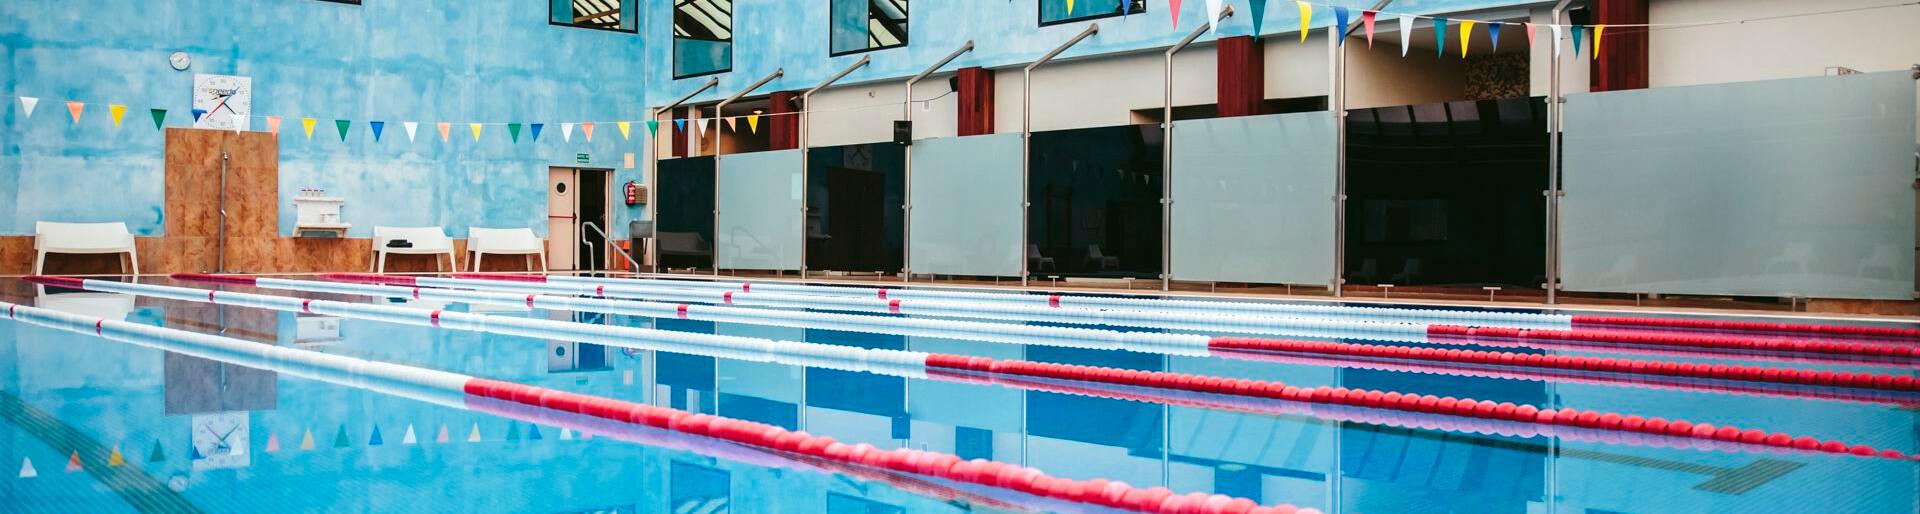 piscina-stadio